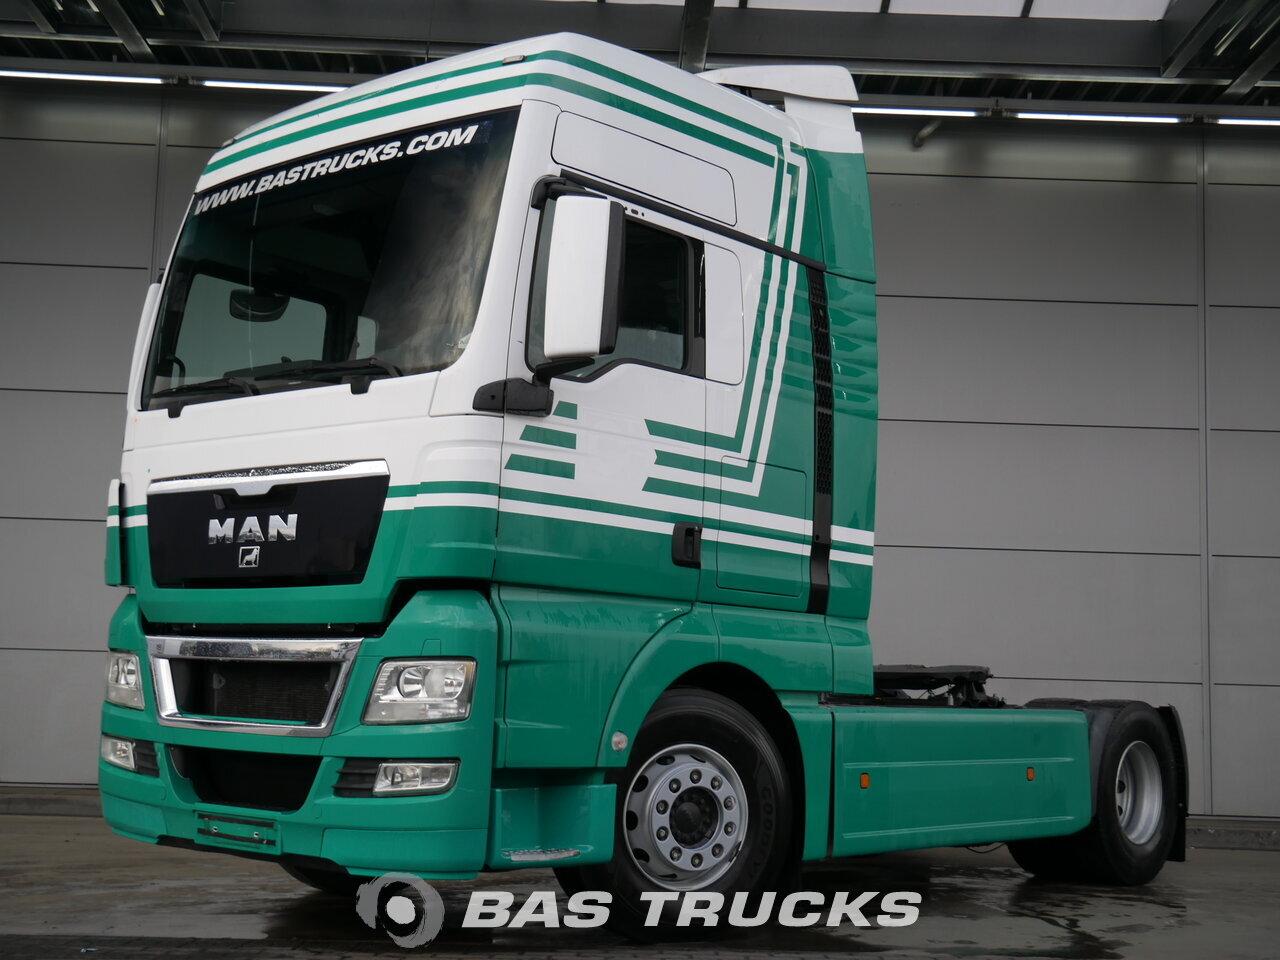 man tgx xxl tractorhead euro norm 5 21200 bas trucks. Black Bedroom Furniture Sets. Home Design Ideas